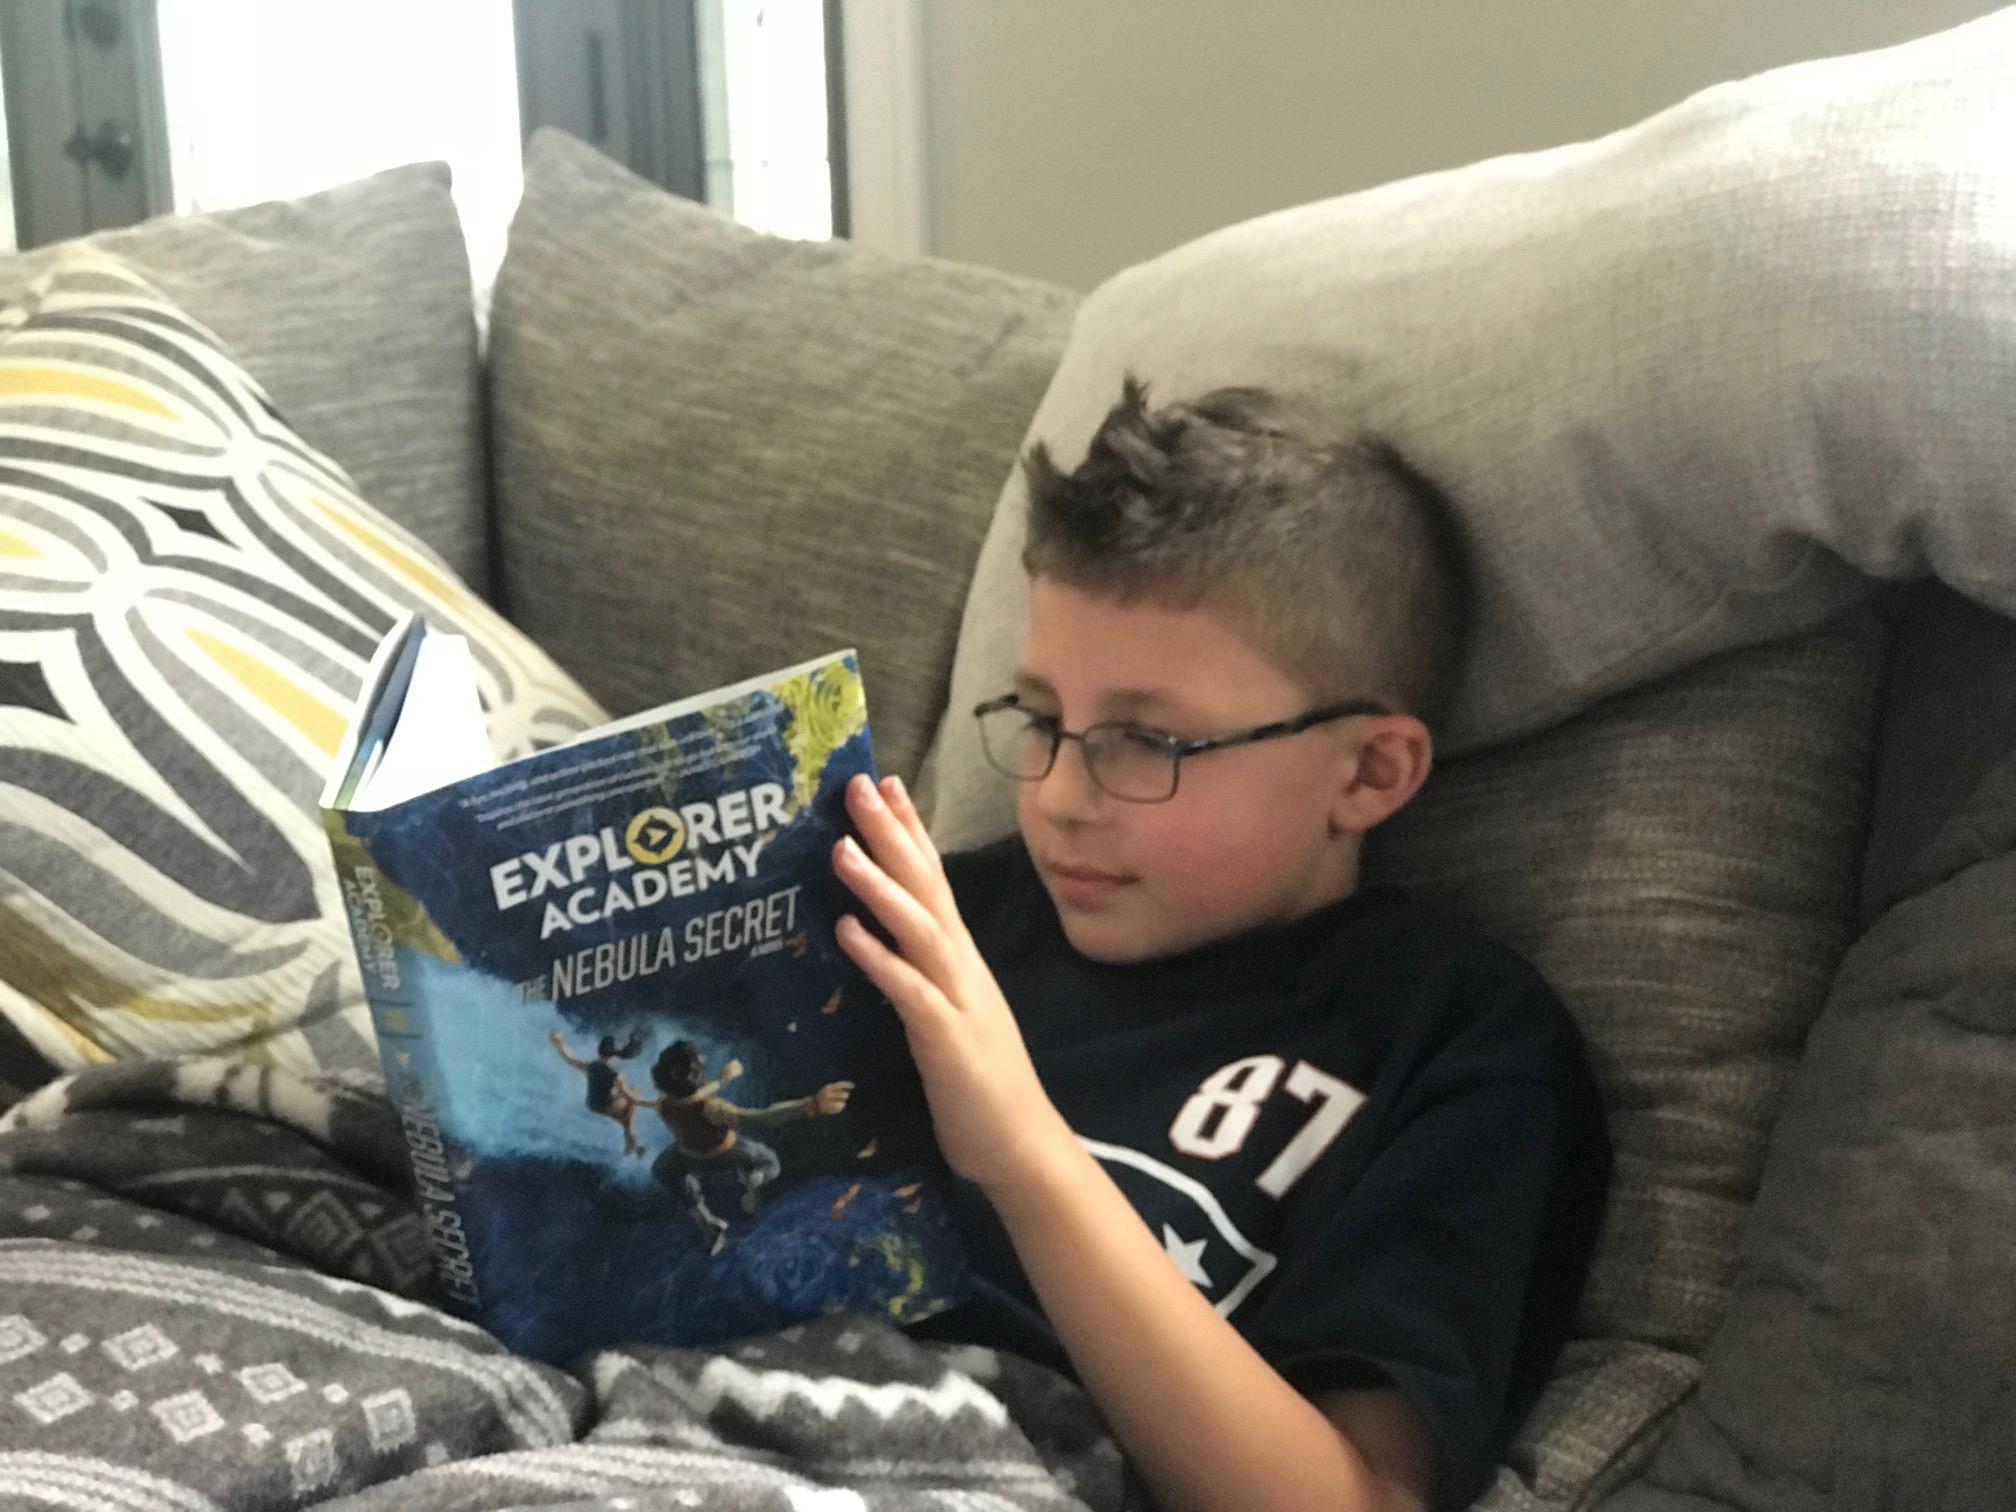 Boy Reading Explorer Academy Nebula Secret